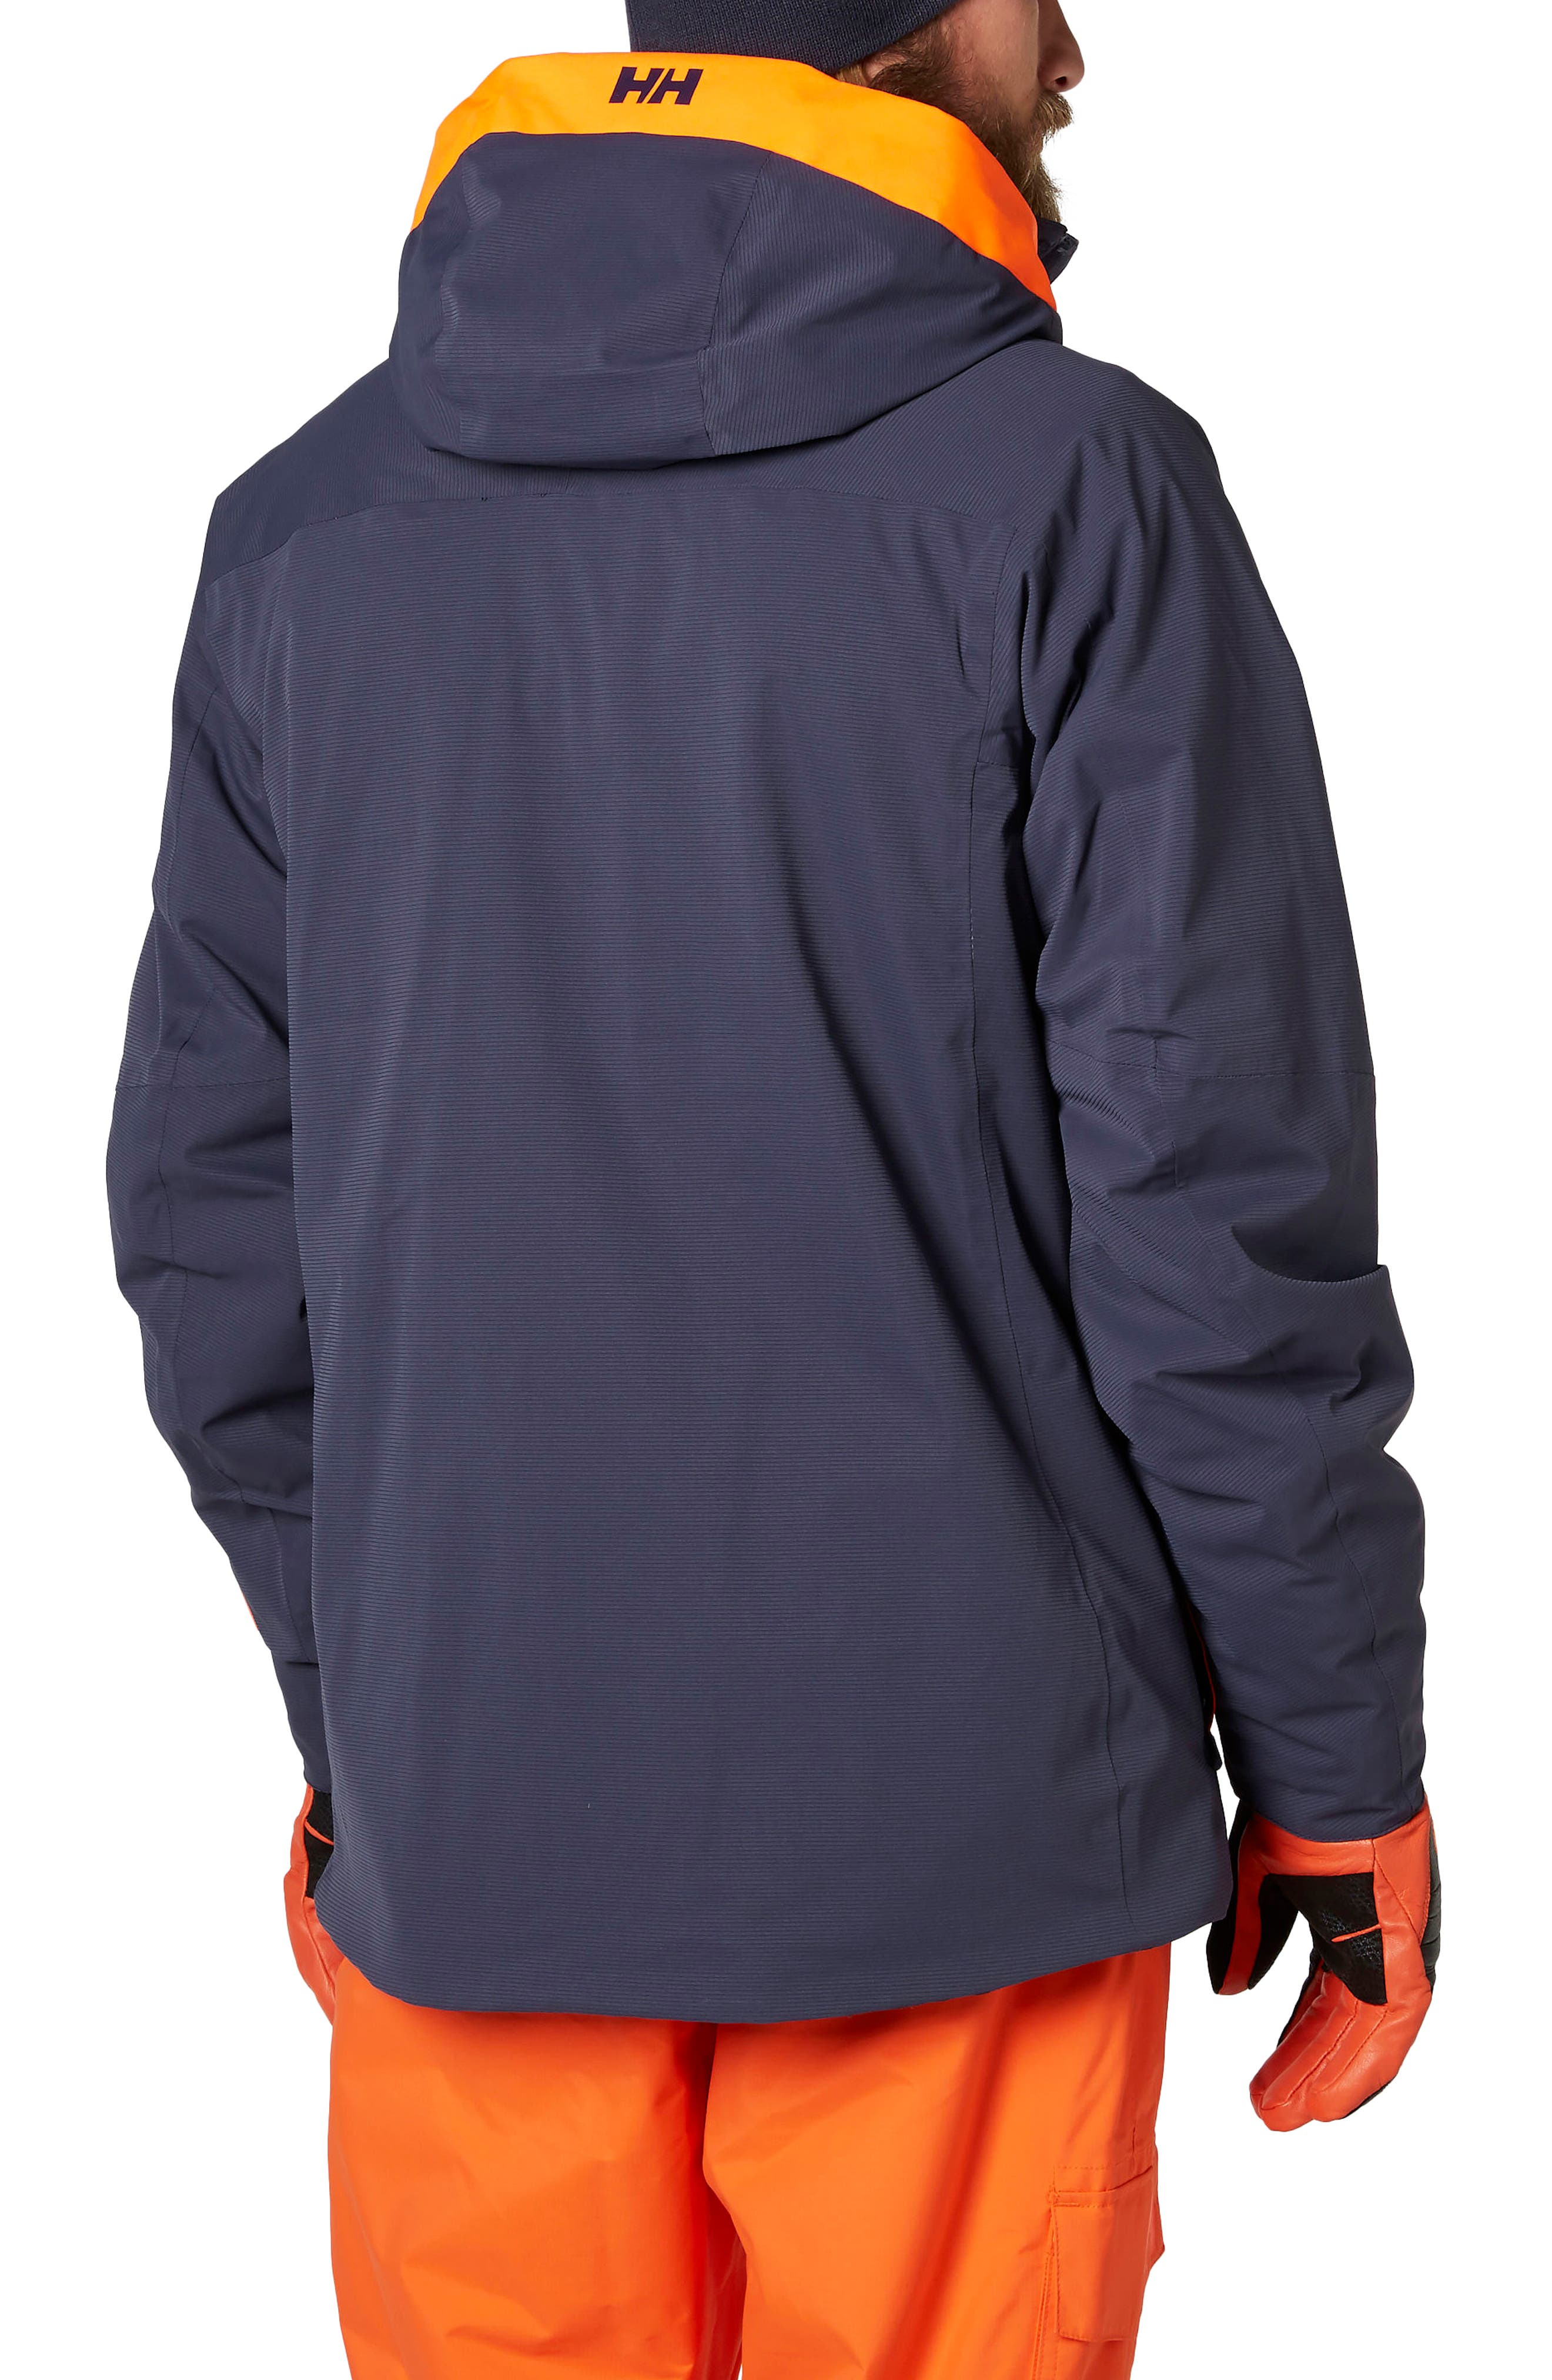 Vestland Waterproof Jacket,                             Alternate thumbnail 2, color,                             Graphite Blue